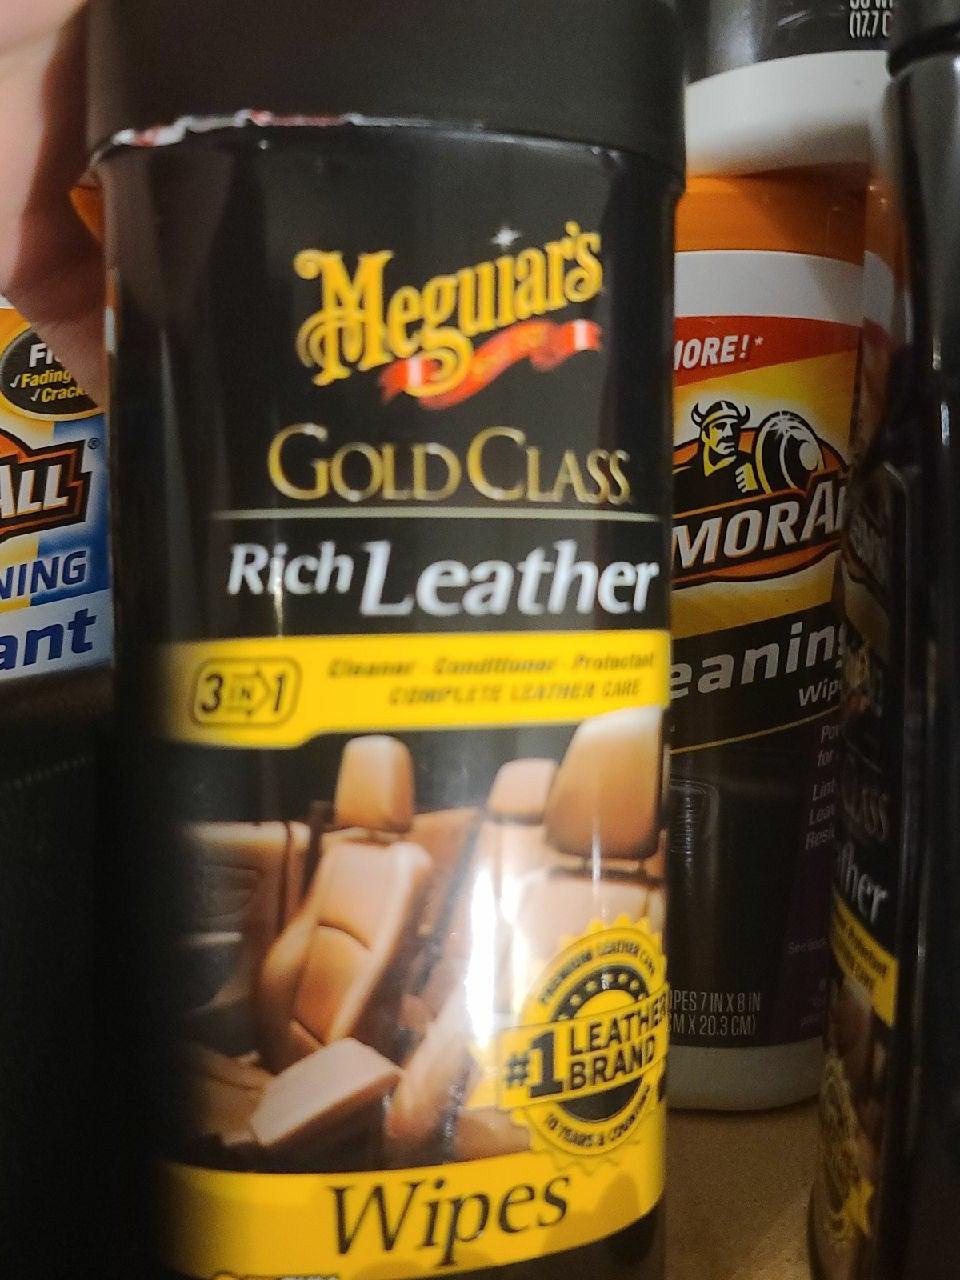 Meguiars gold class rich leather wipe